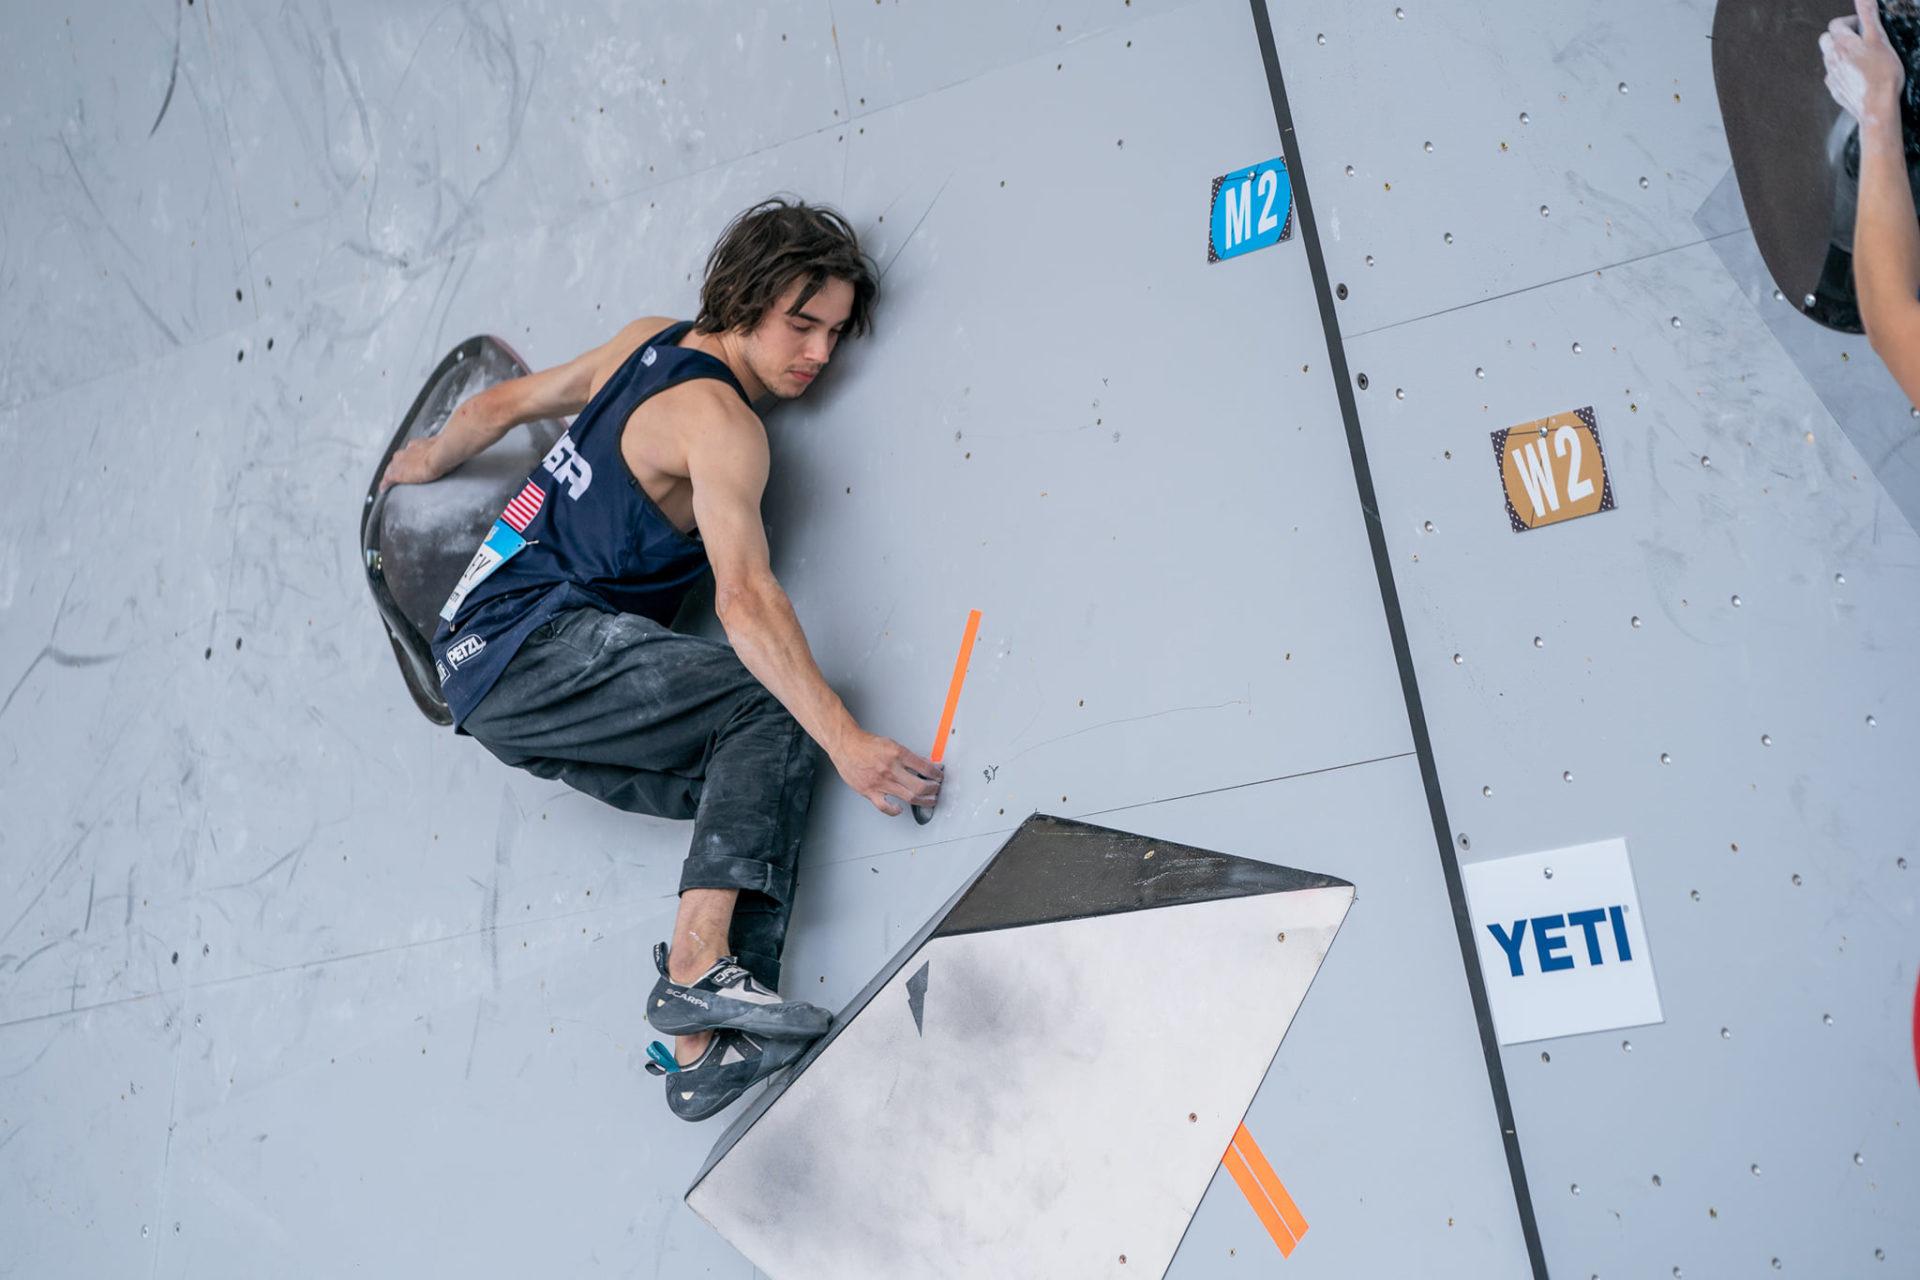 Male USA Climber on climbing wall